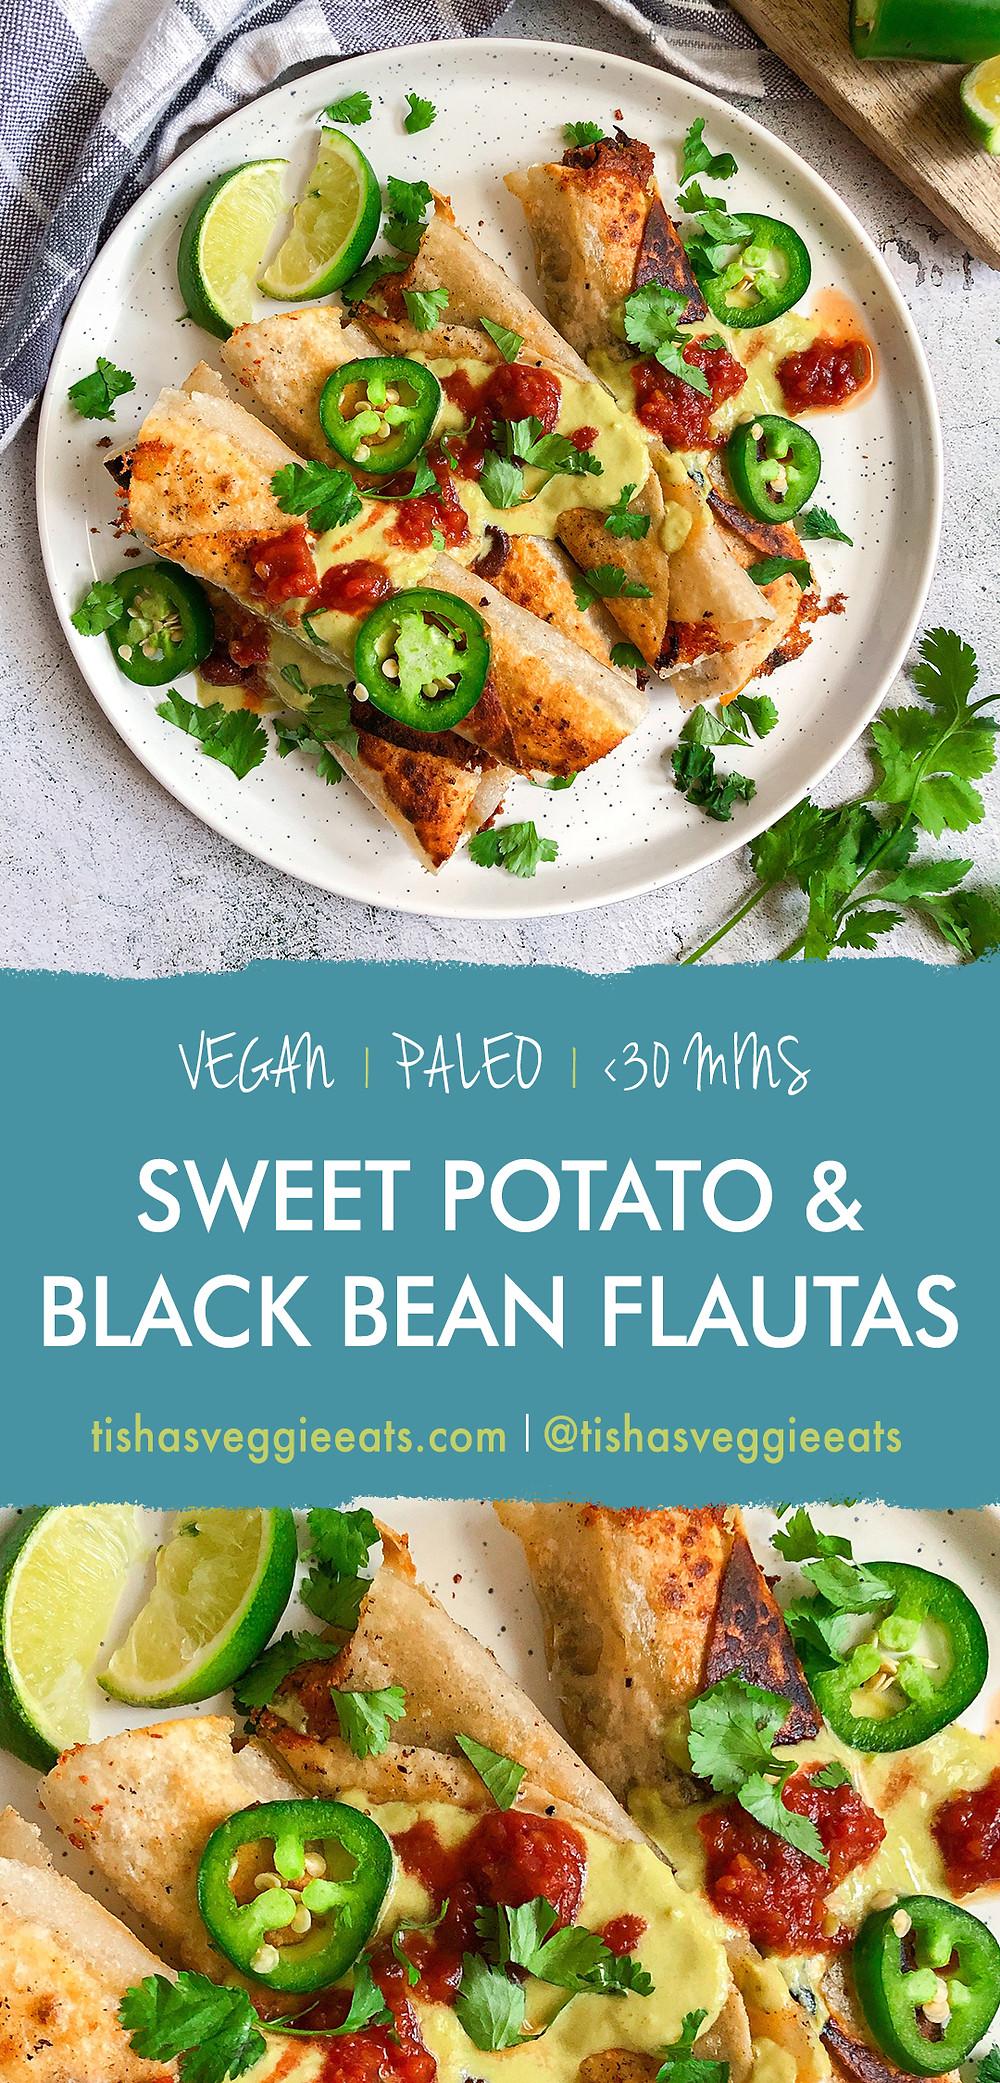 Vegan Chorizo Jicama Tacos with Creamy Jalapeno Salsa - Pinterest Image